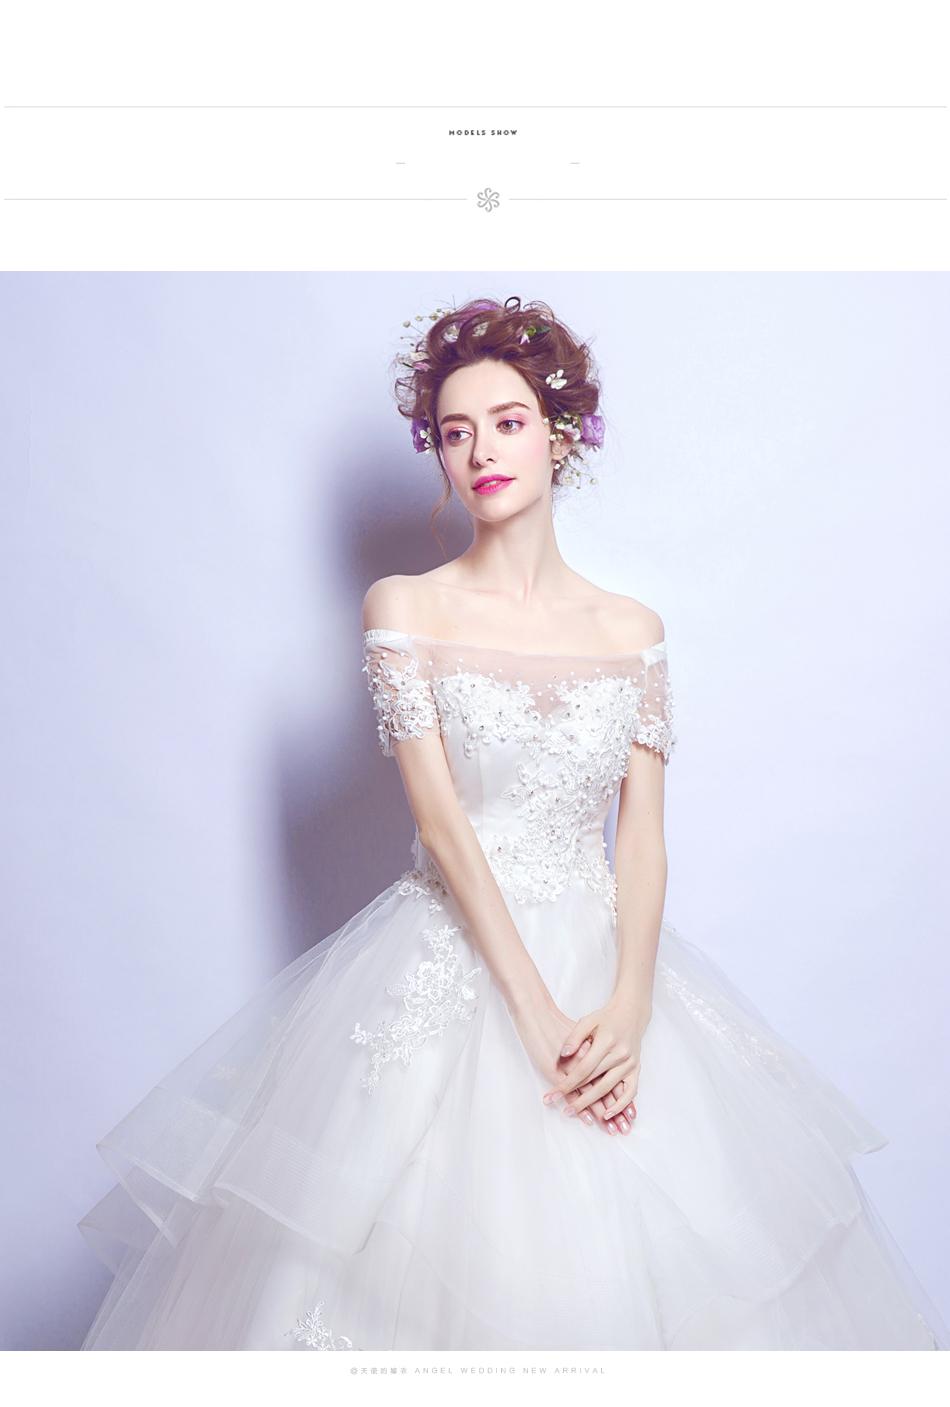 Angel Wedding Dress Marriage Bride Bridal Gown Vestido De Noiva 2017 Boat Neck Nail, lace, 2129 9